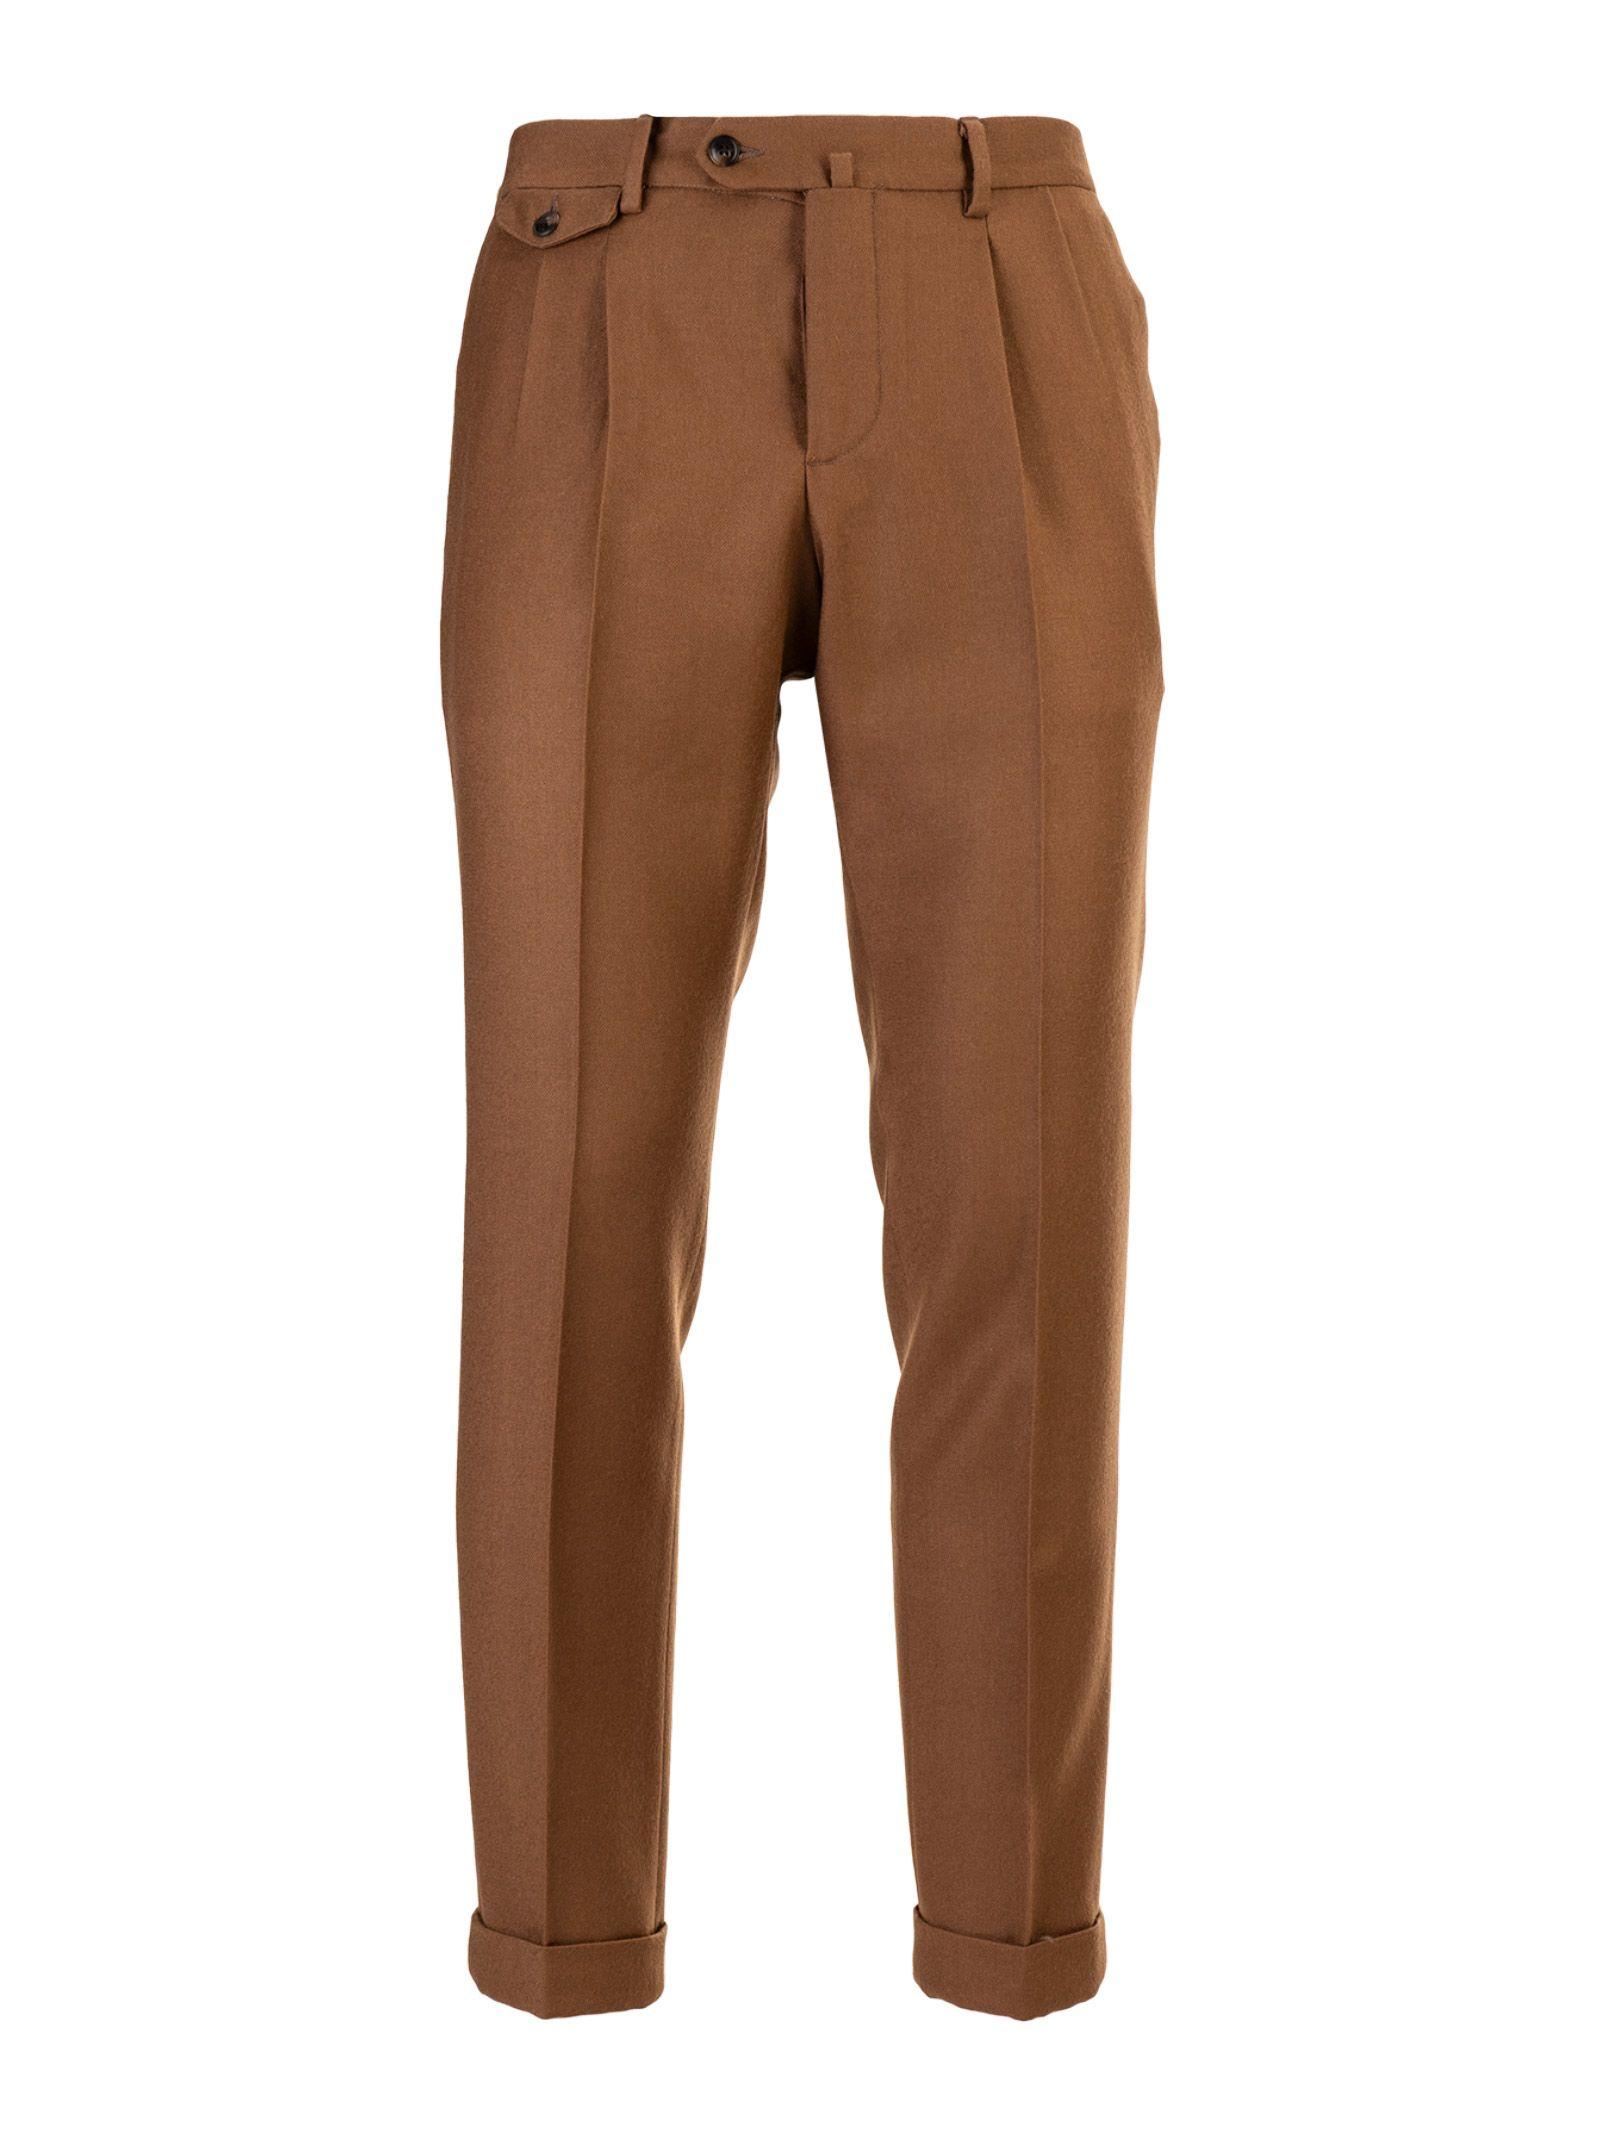 Brgilia 1949 Trousers